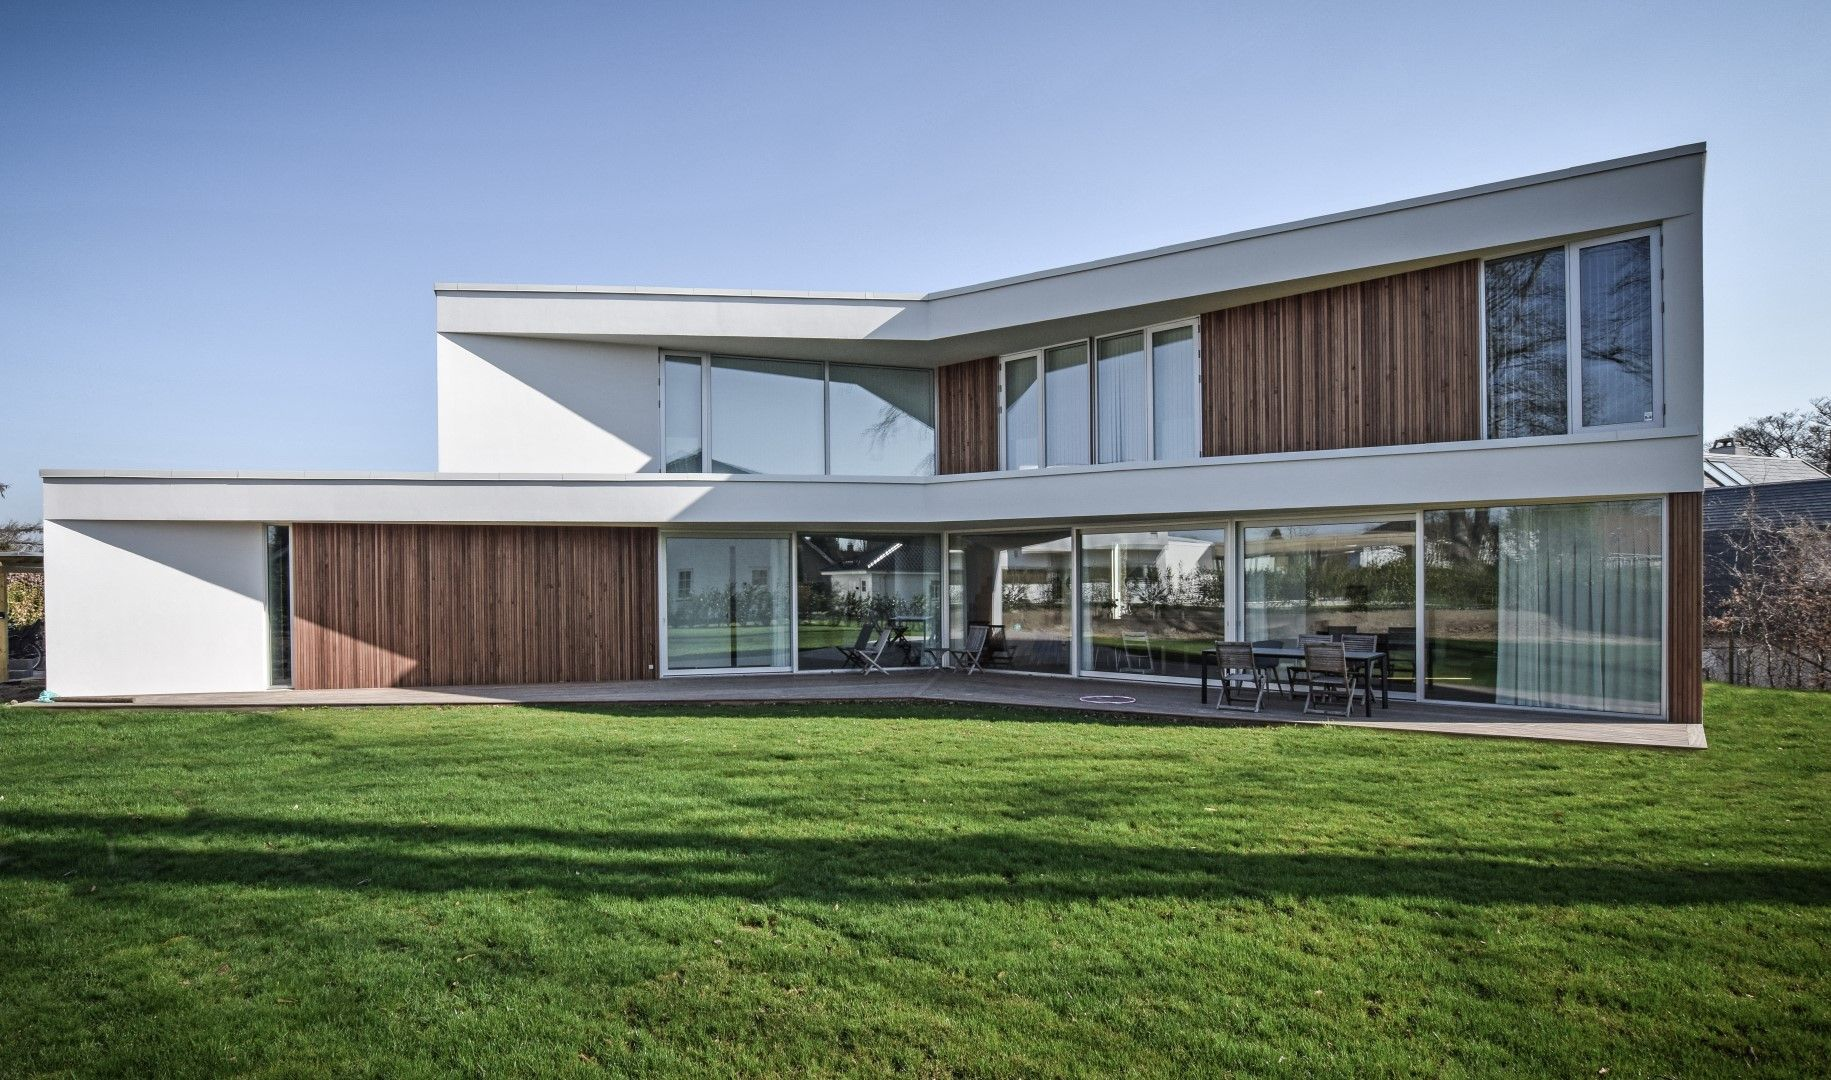 Home park design bilder house y  np arkitektur  moderne woningen  pinterest  house